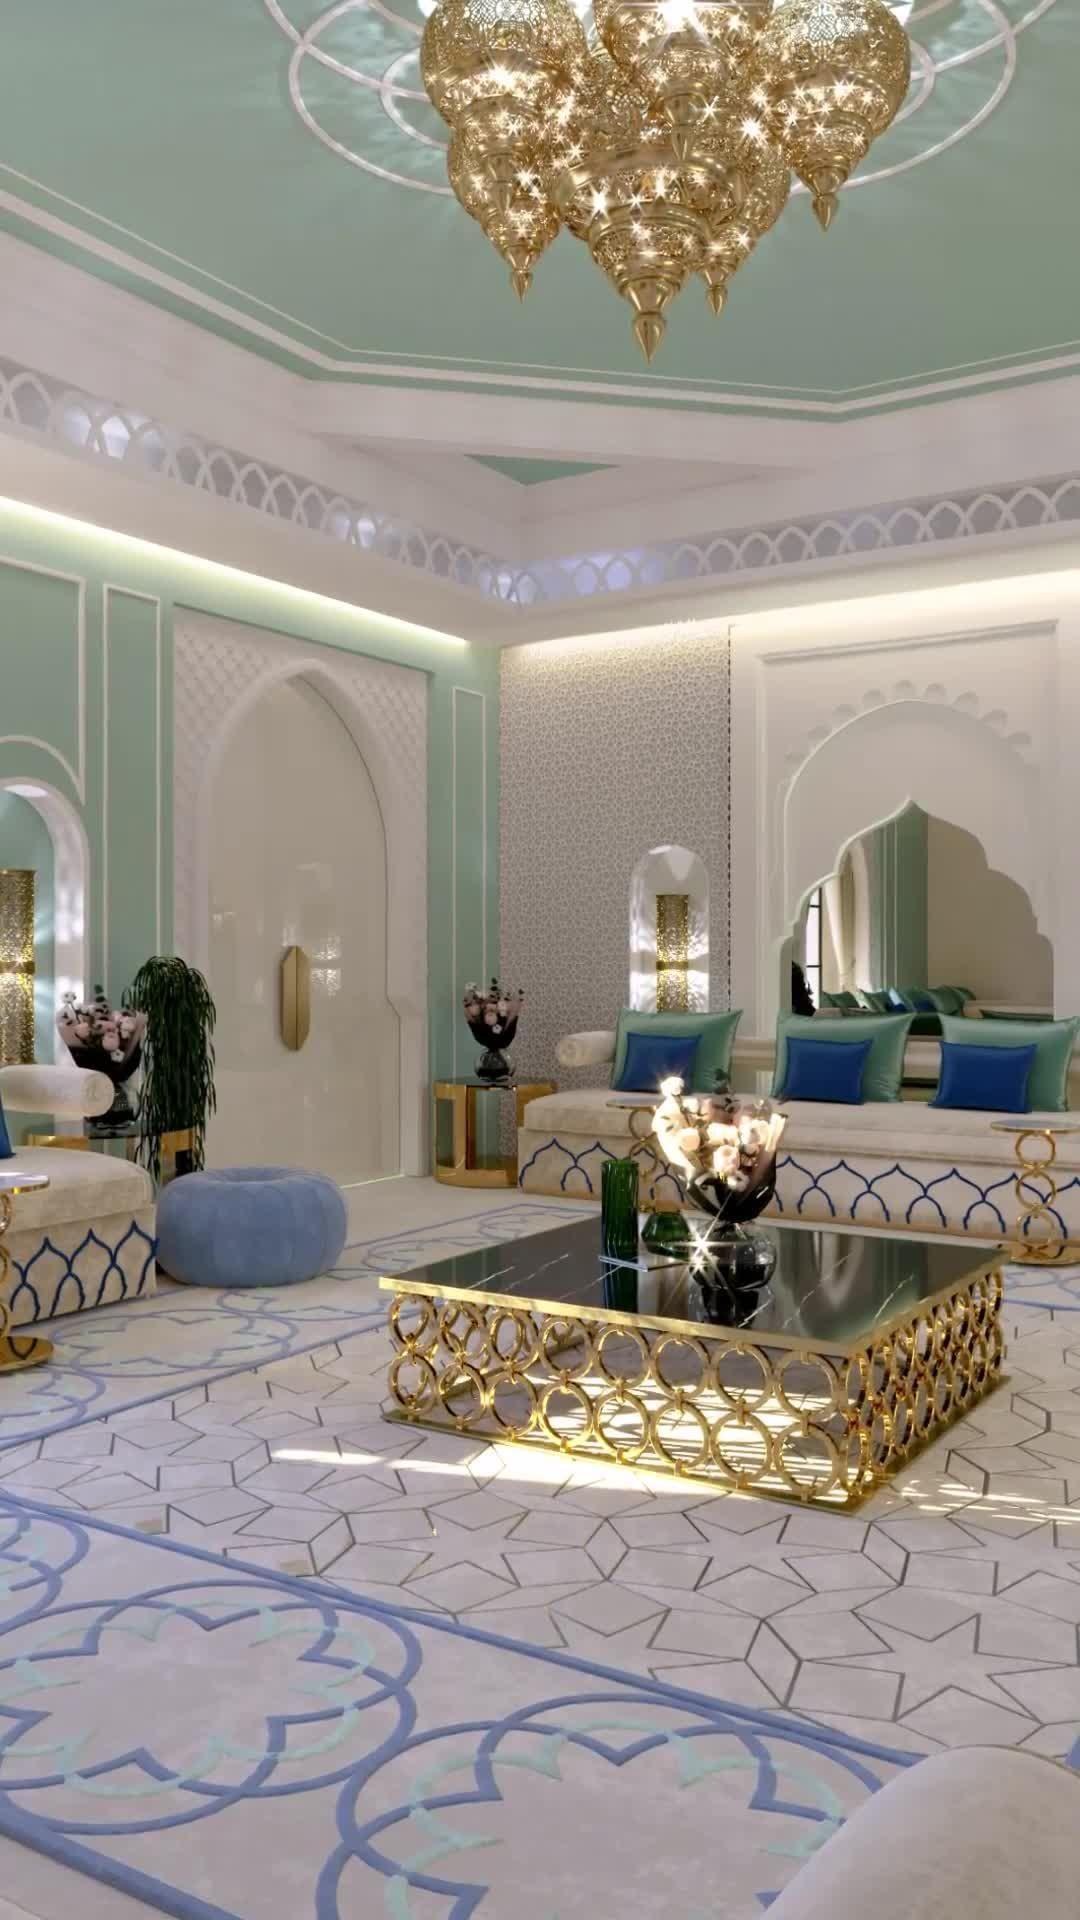 Modern Moroccan Style Interior Design And Home Decor In Dubai Video Video Luxury House Interior Design Interior Design Dubai Moroccan Style Interior